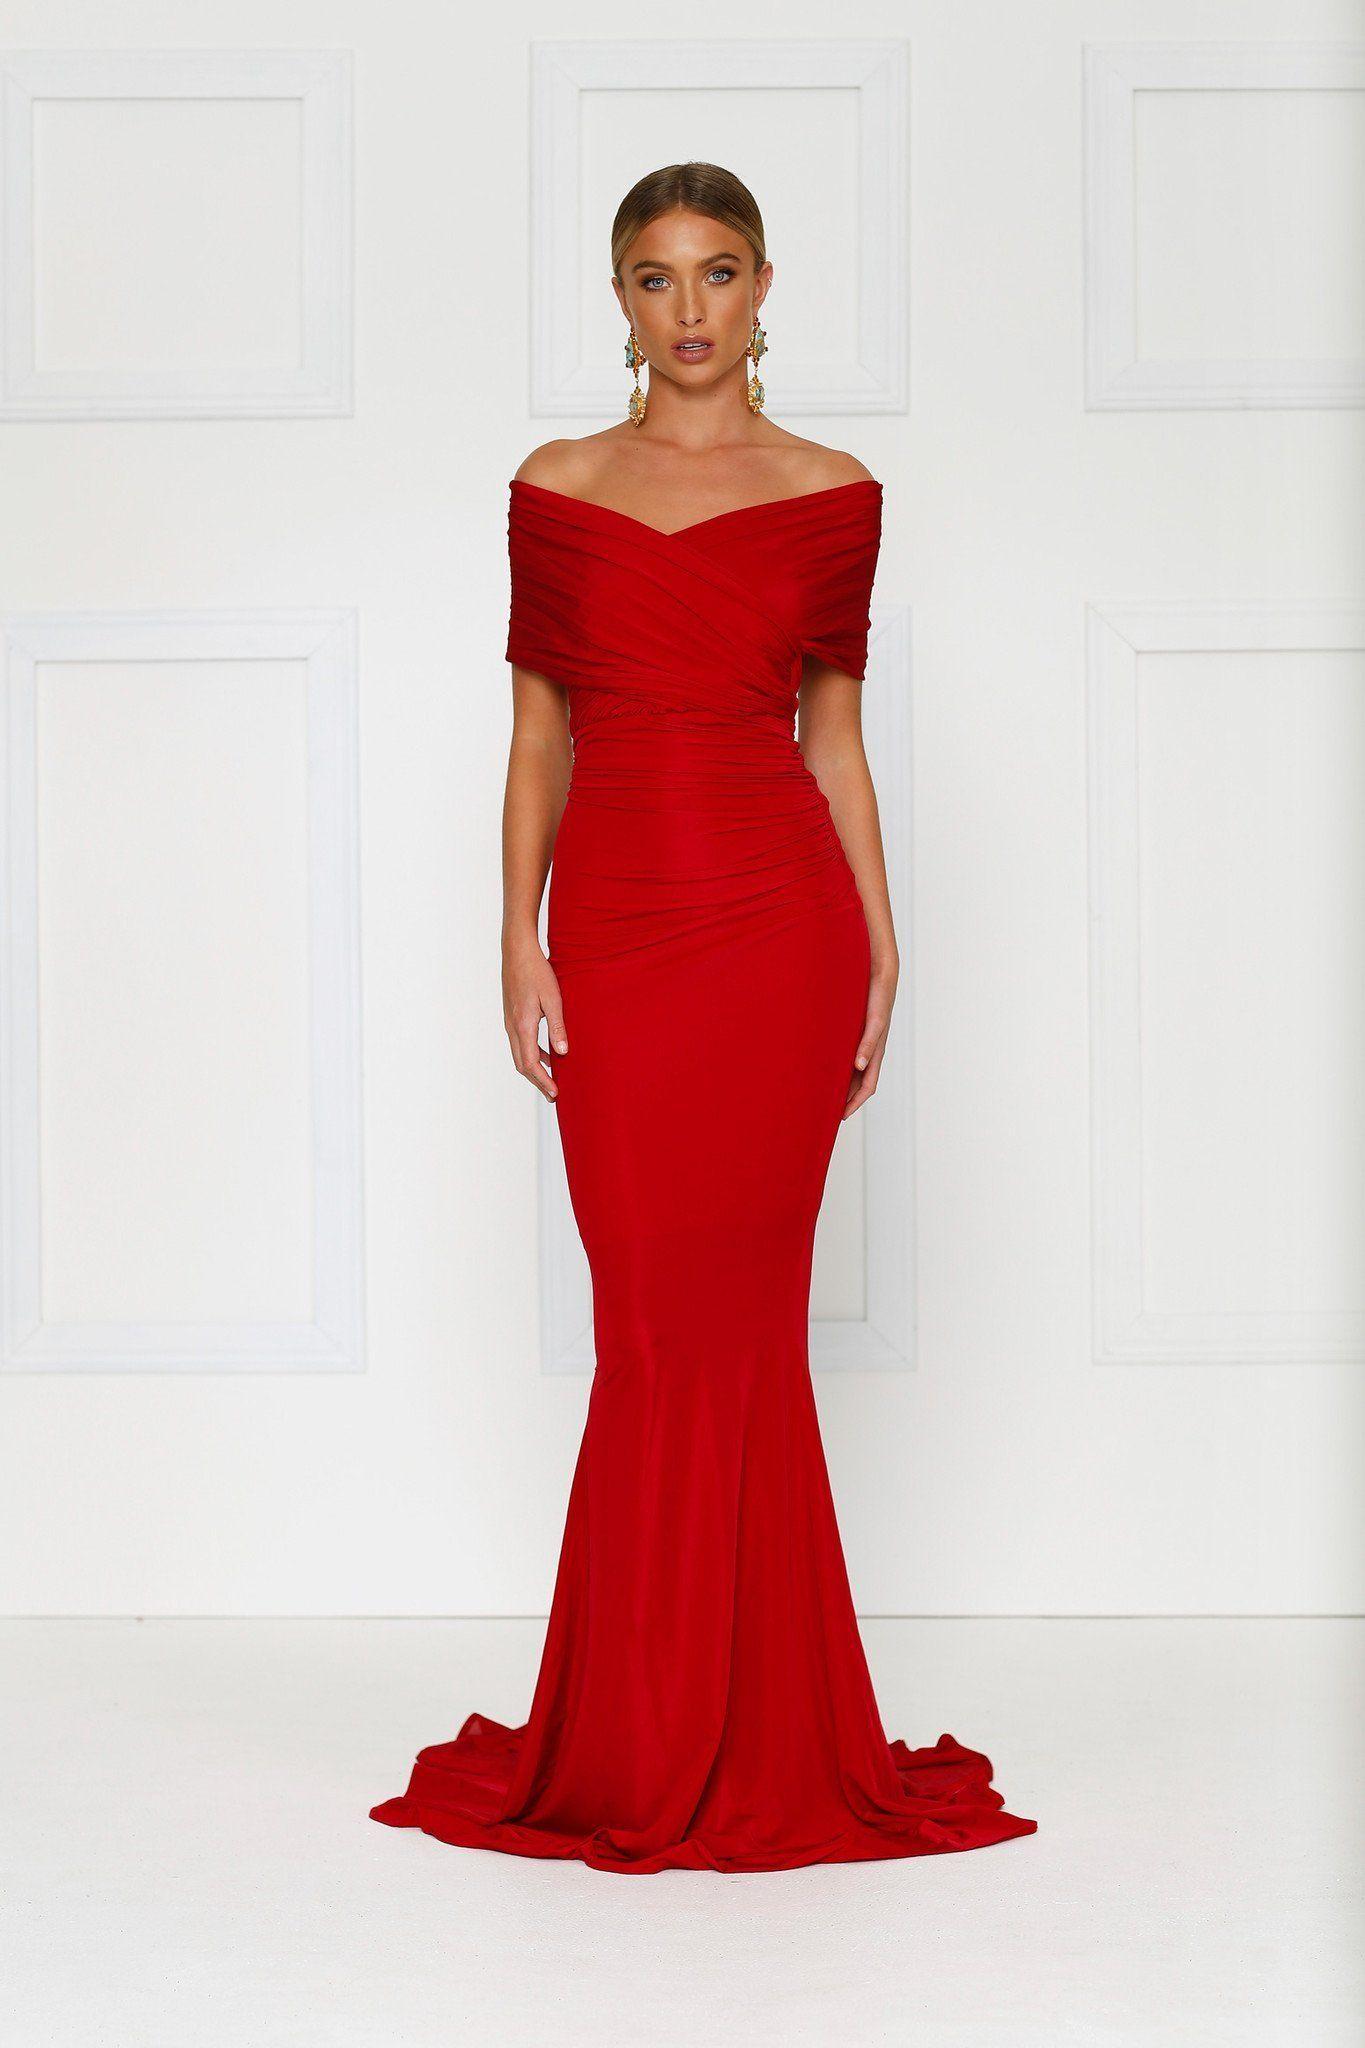 c3edaf53ec85 Campanule Off-shoulder Gown - Wine Red